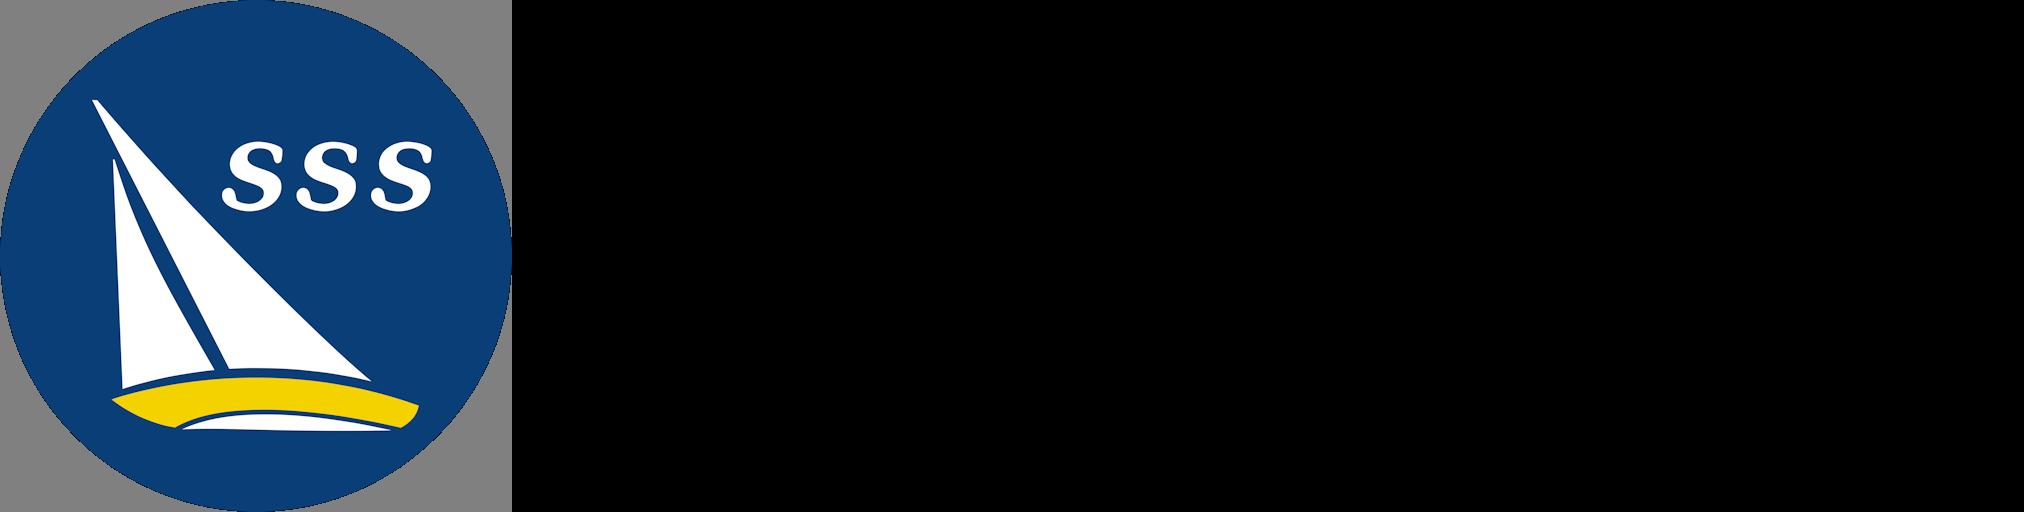 Segelsällskapet Slören